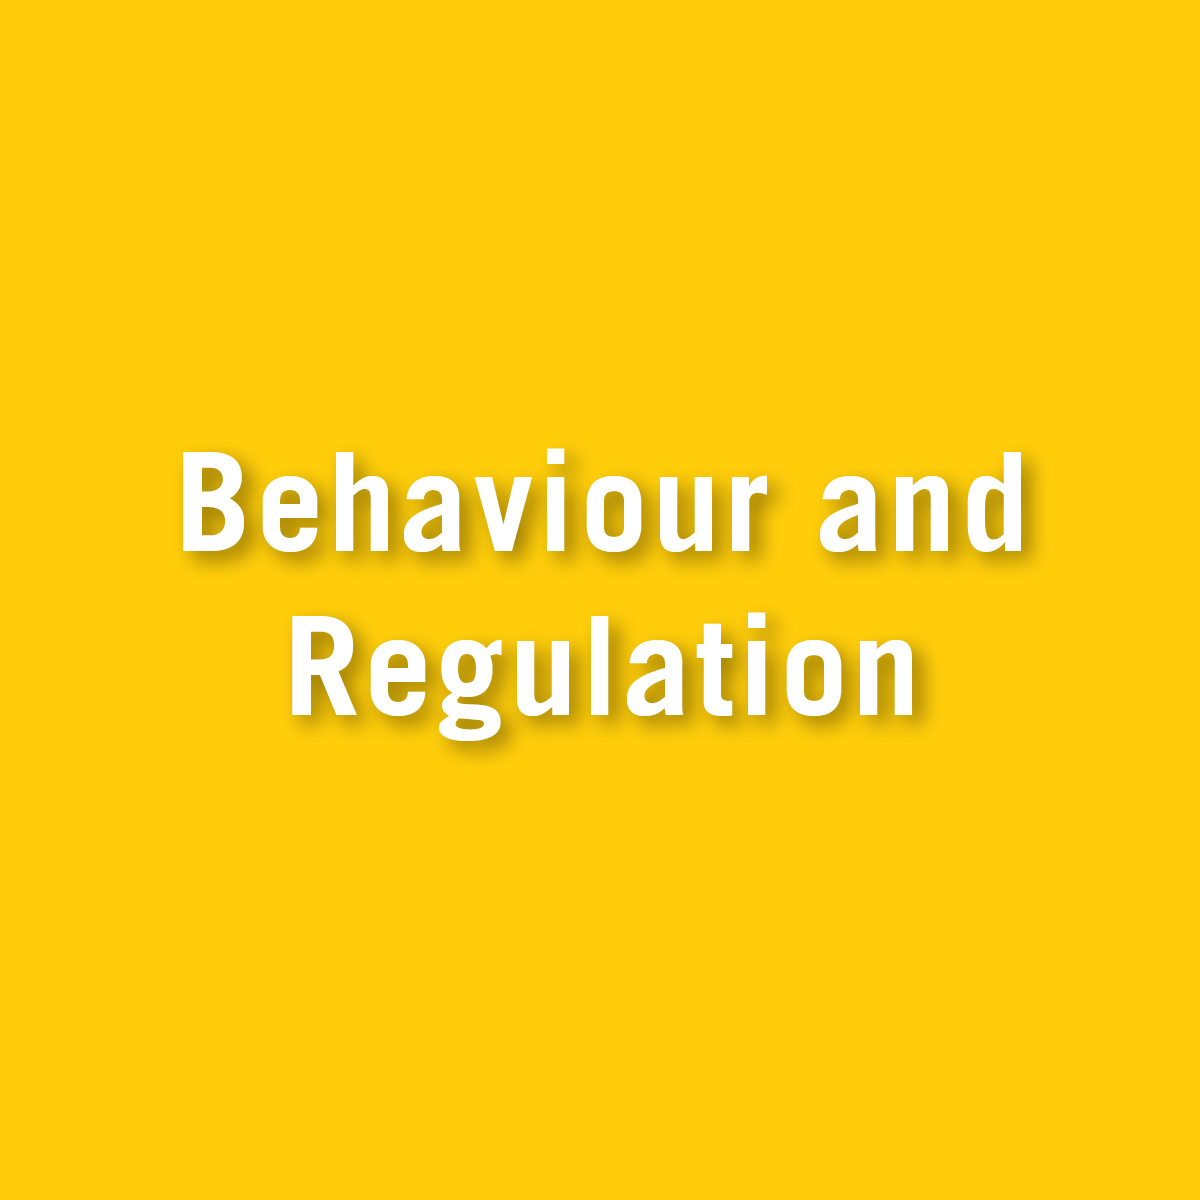 Behaviour and Regulation